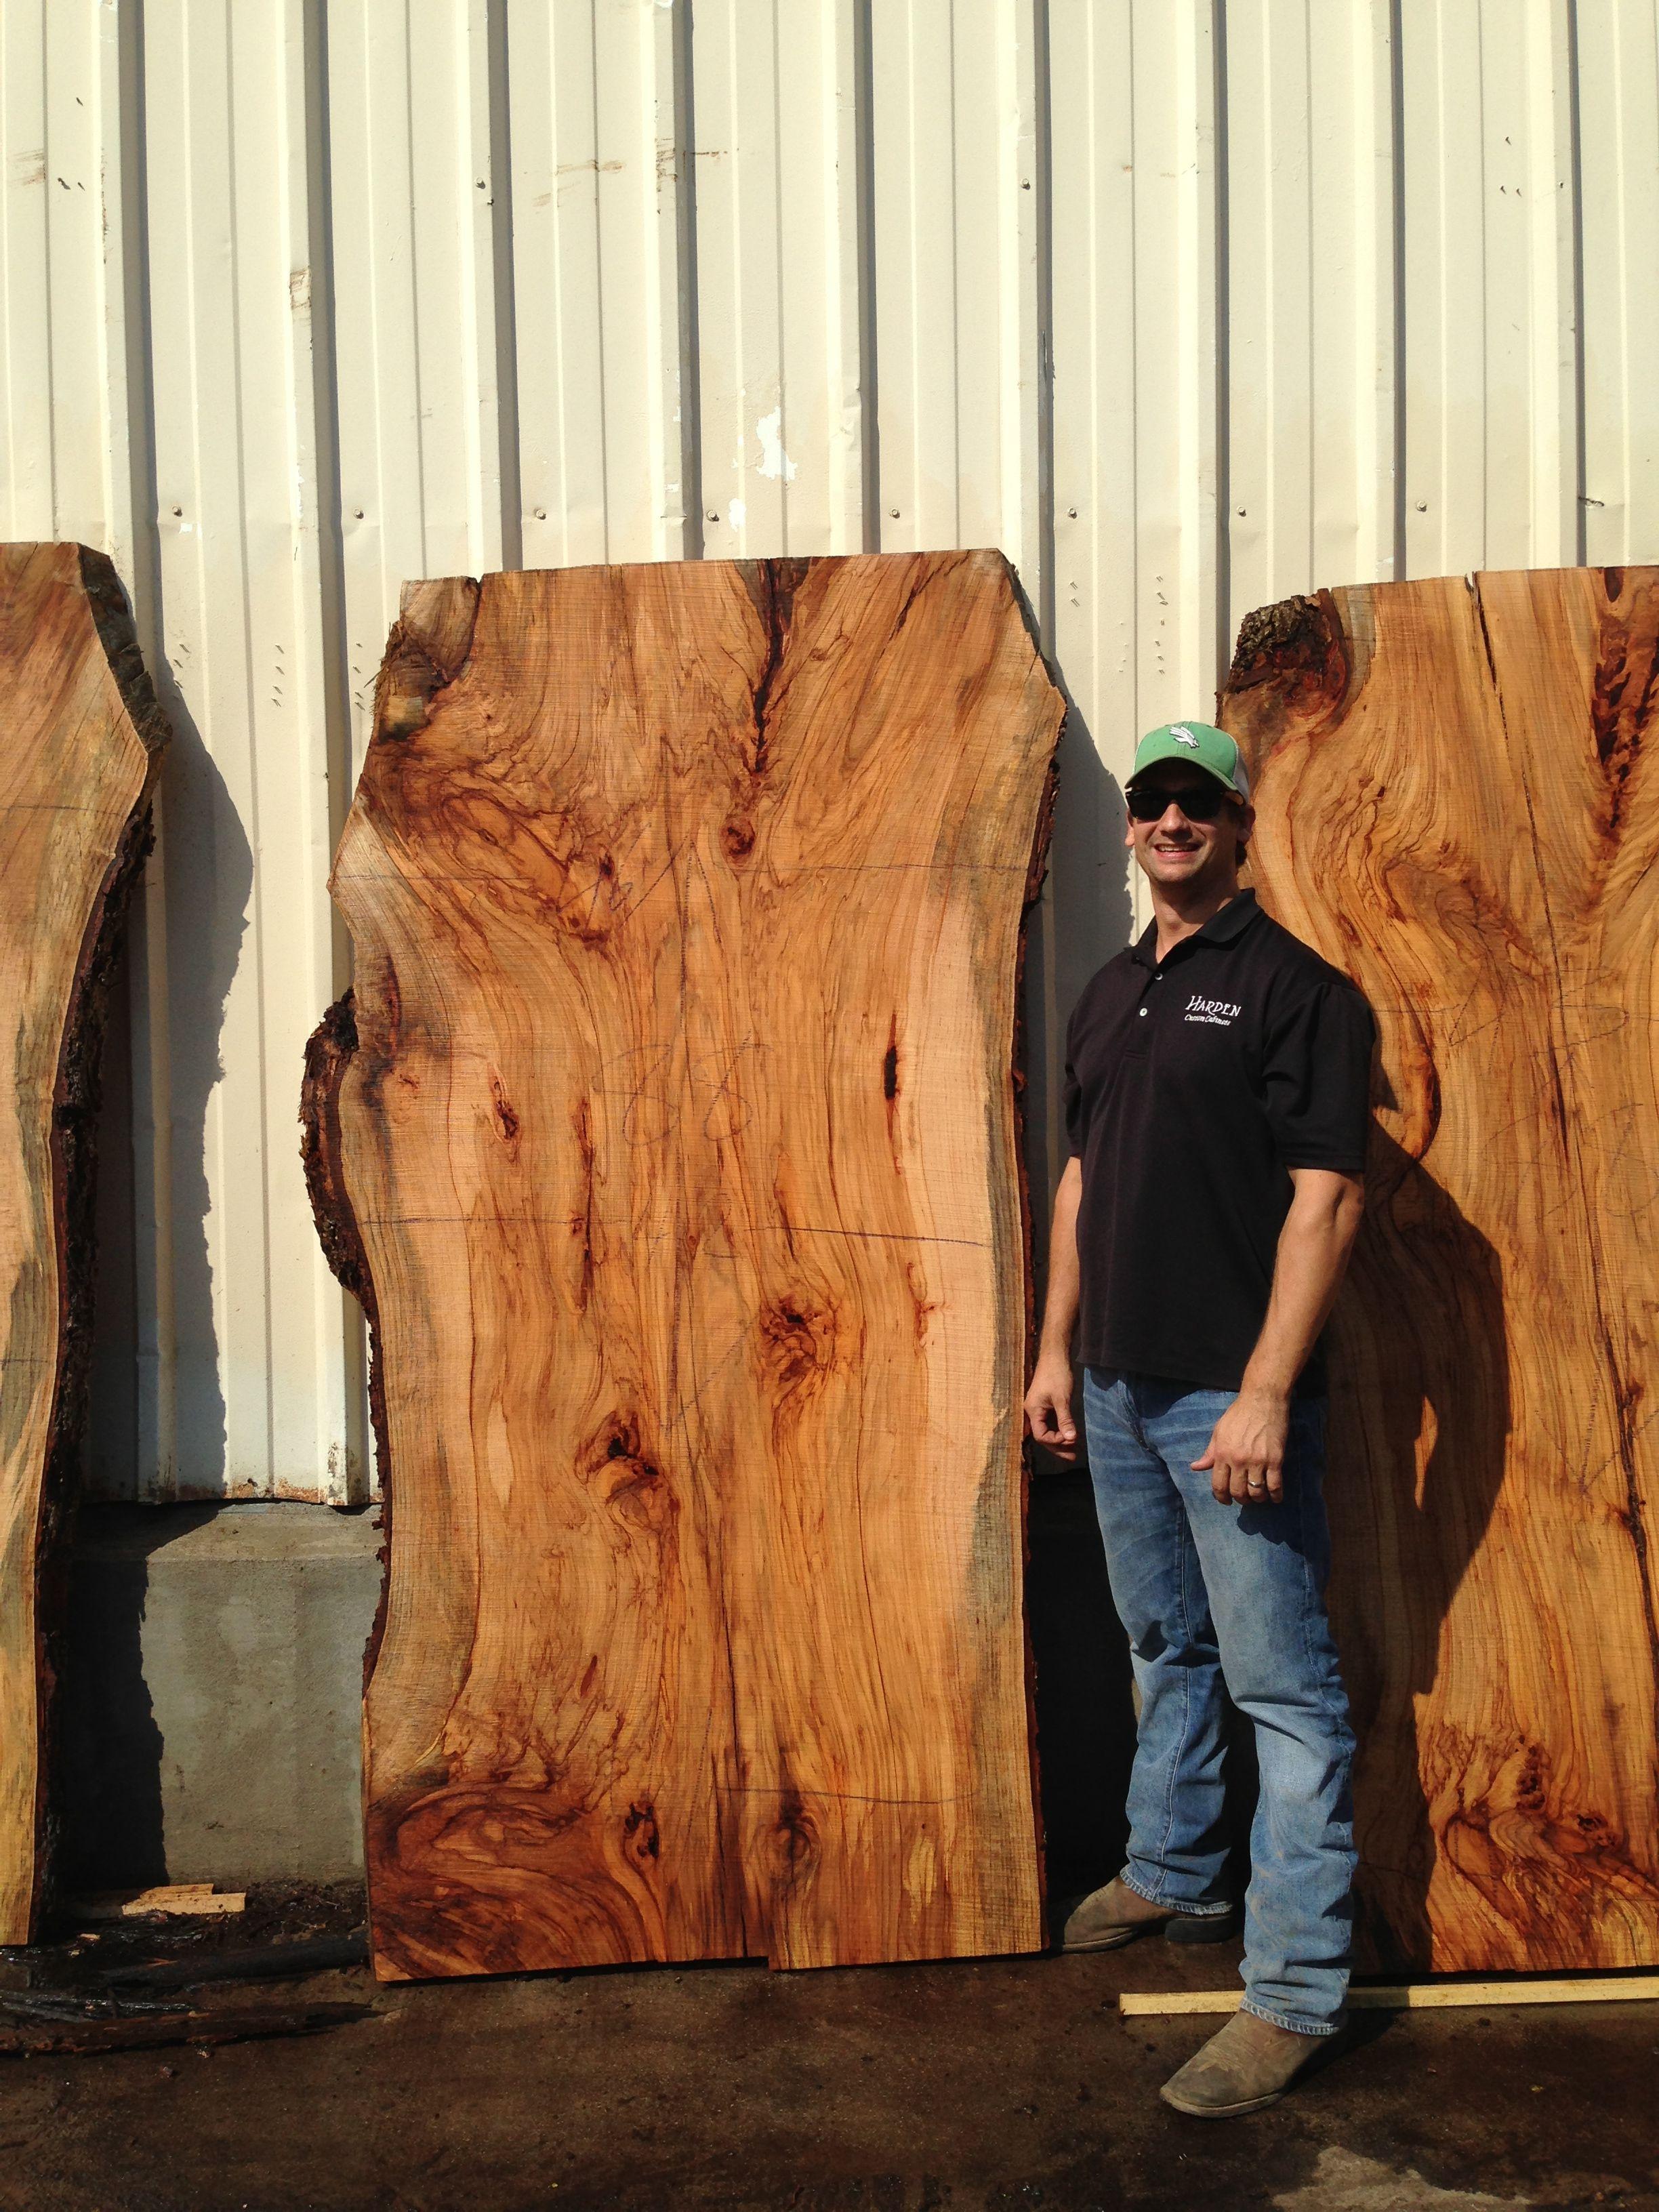 Pecan Slab 08 29 13 5a Jpg 2448 3264 Natural Edge Wood Slabs For